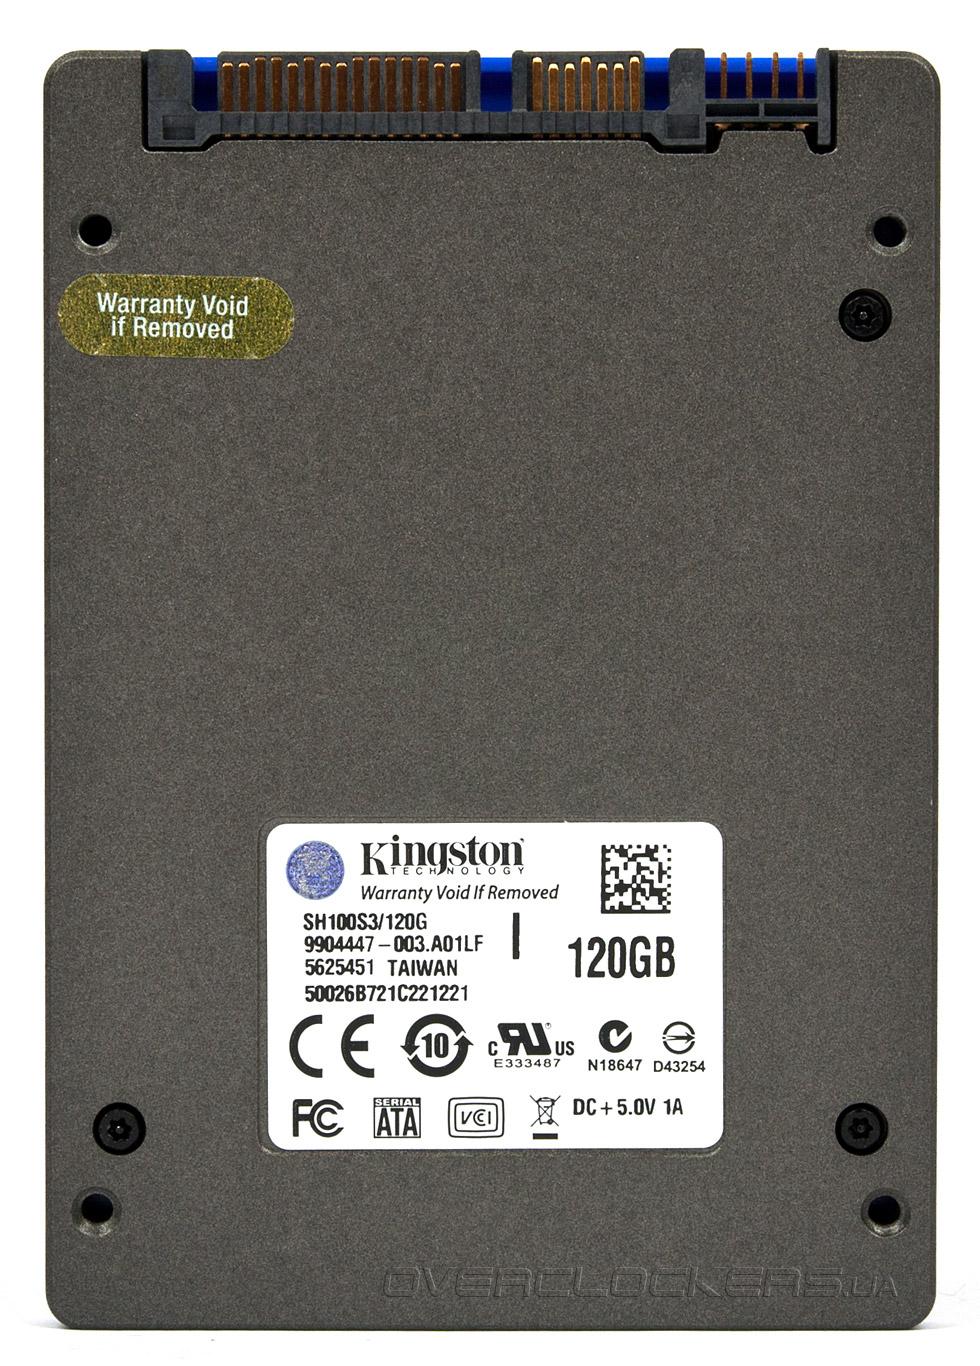 Kingston SH100S3B 120GB SSD Driver for Mac